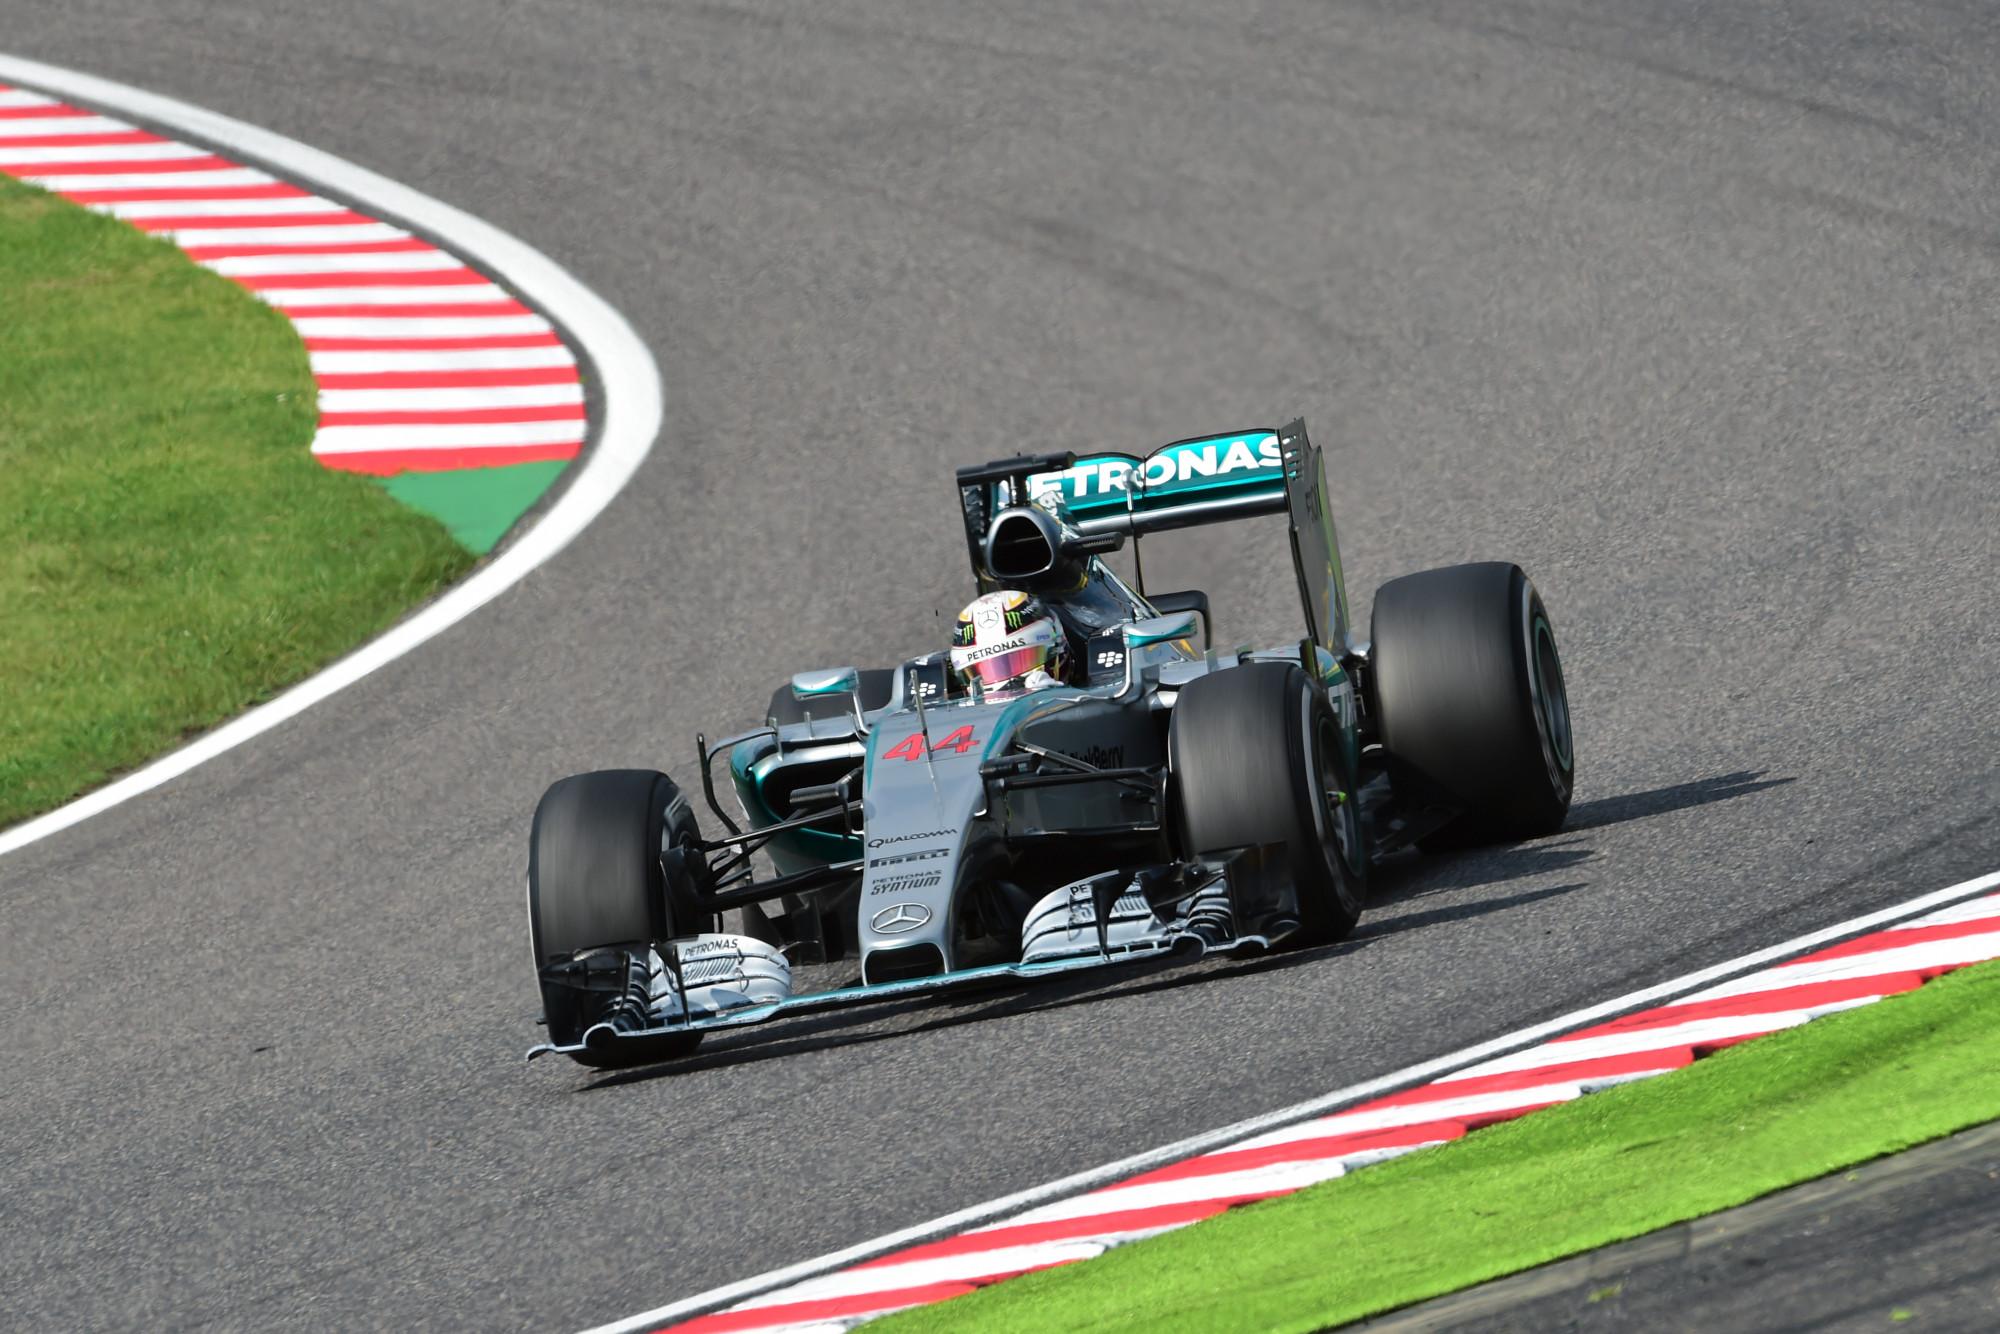 2015 Japanese GP report